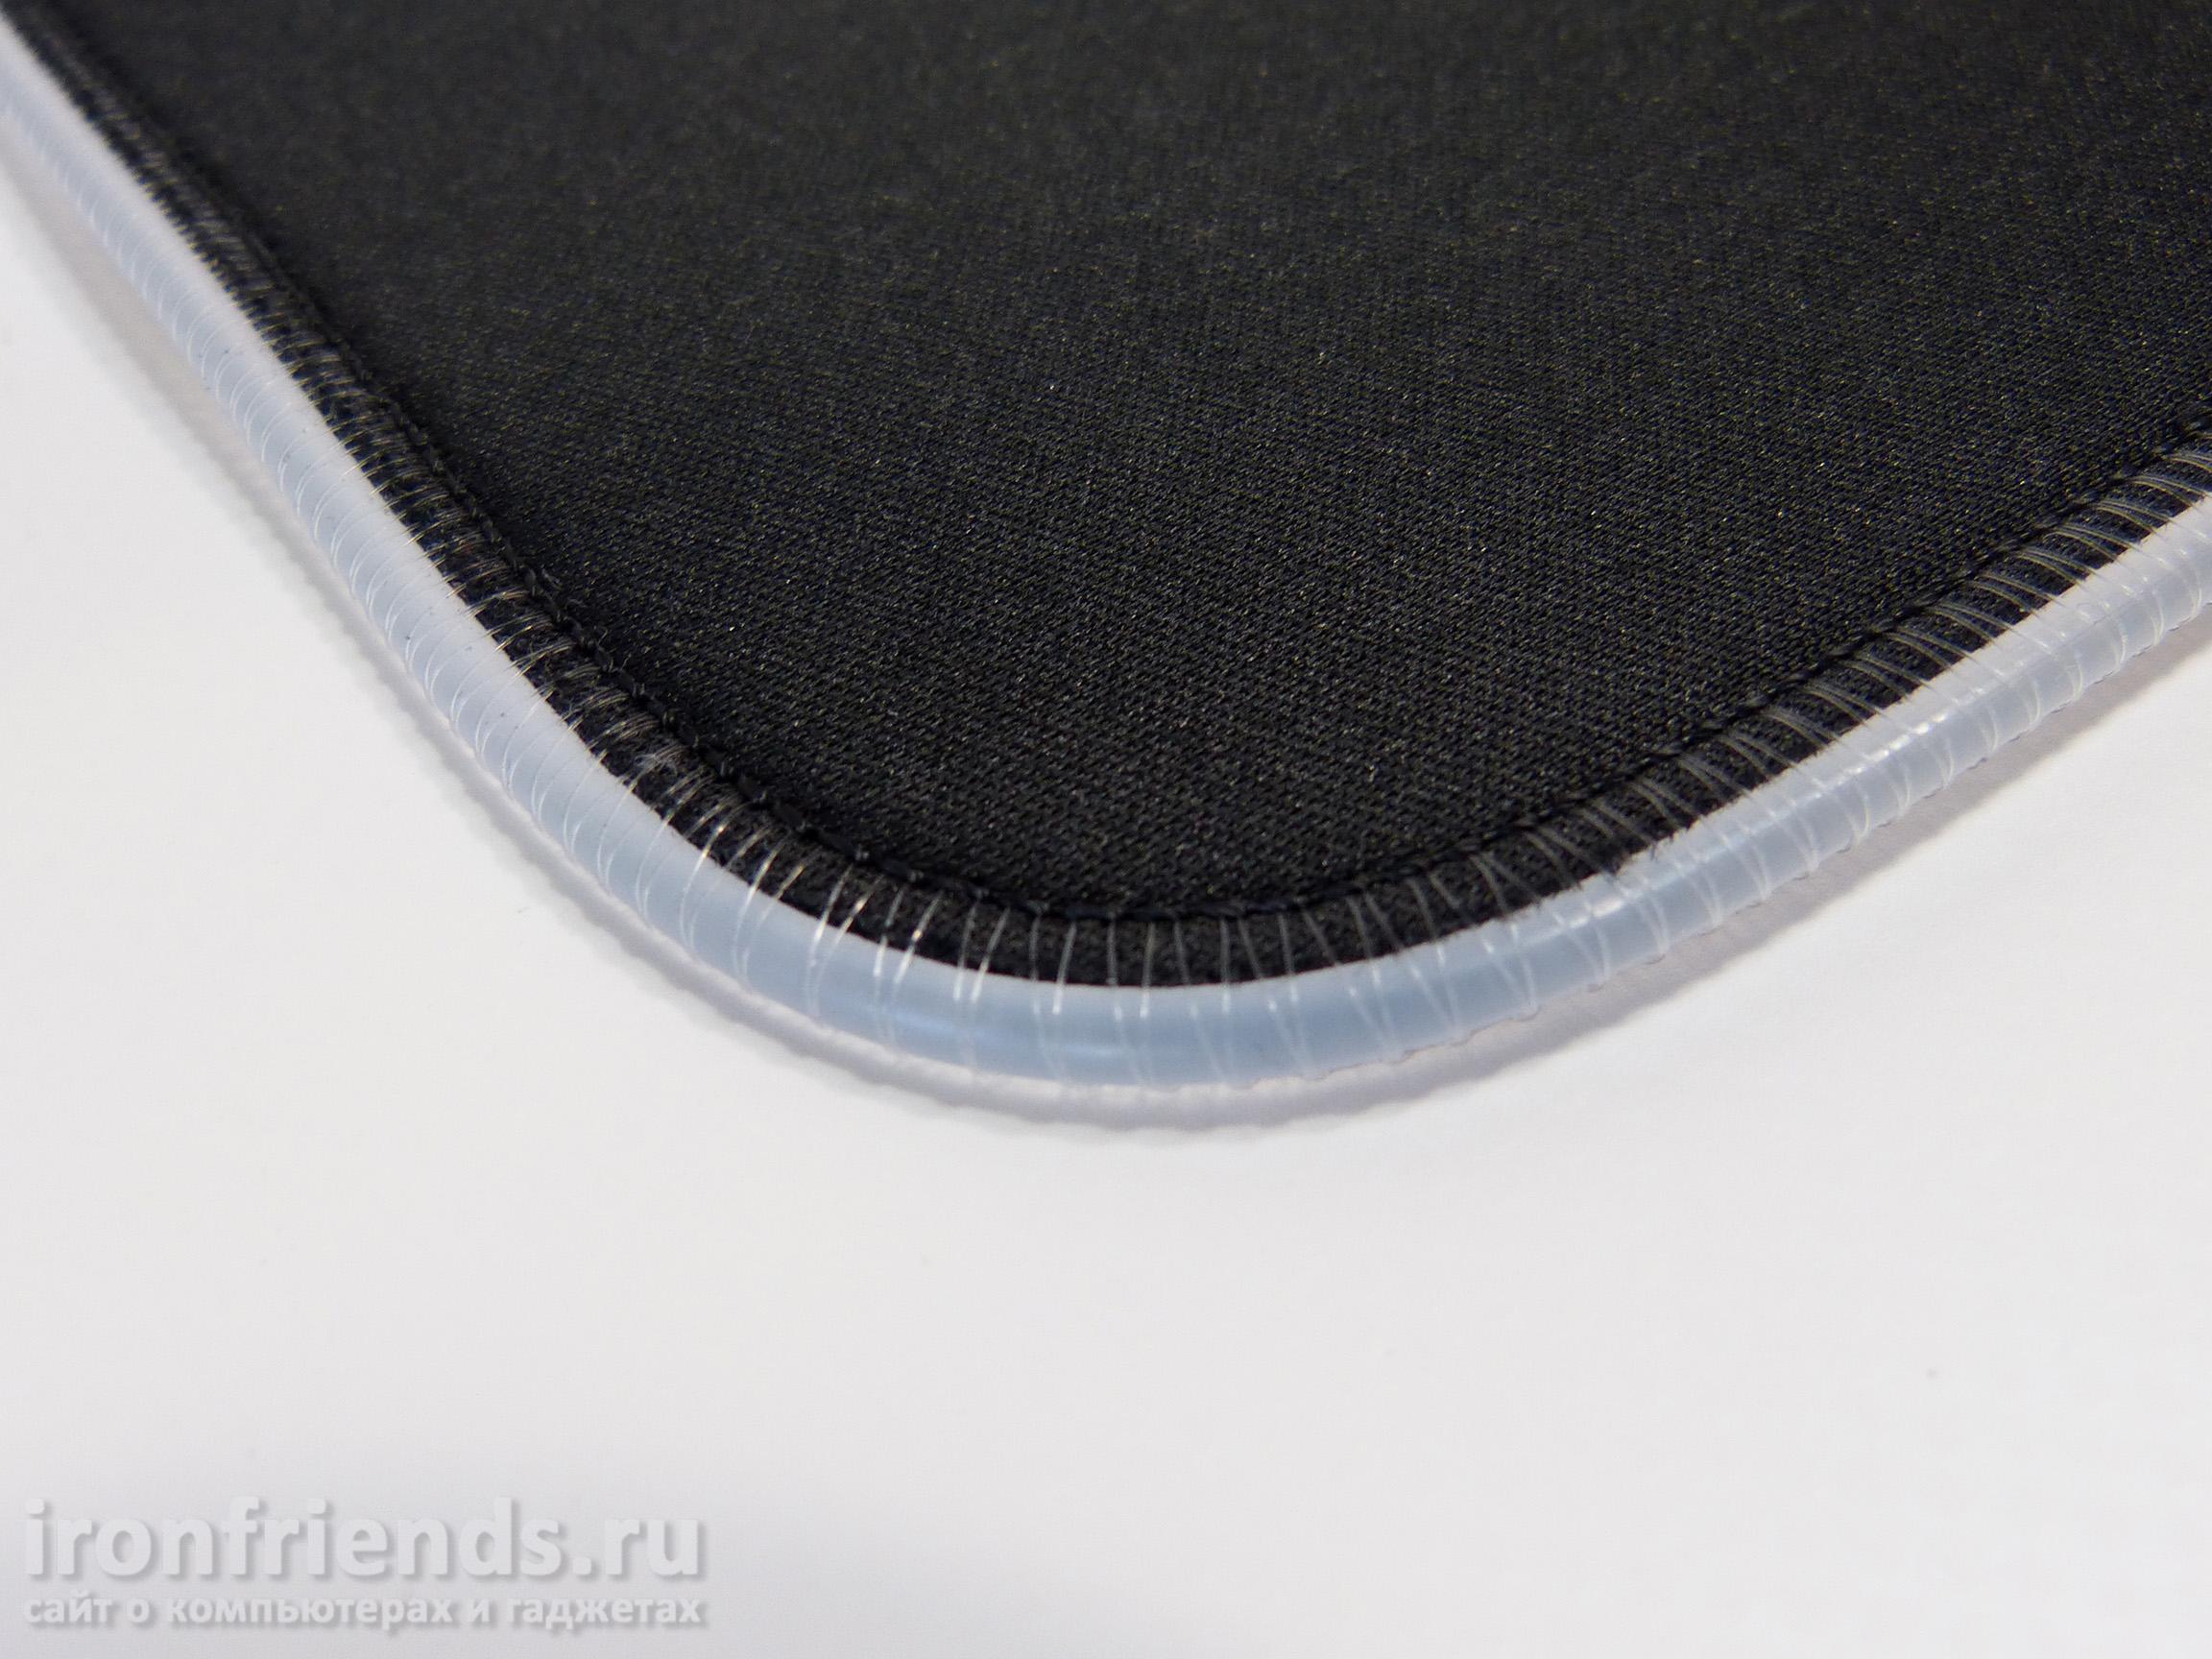 Поверхность коврика Tronsmart Spire RGB Mouse Pad